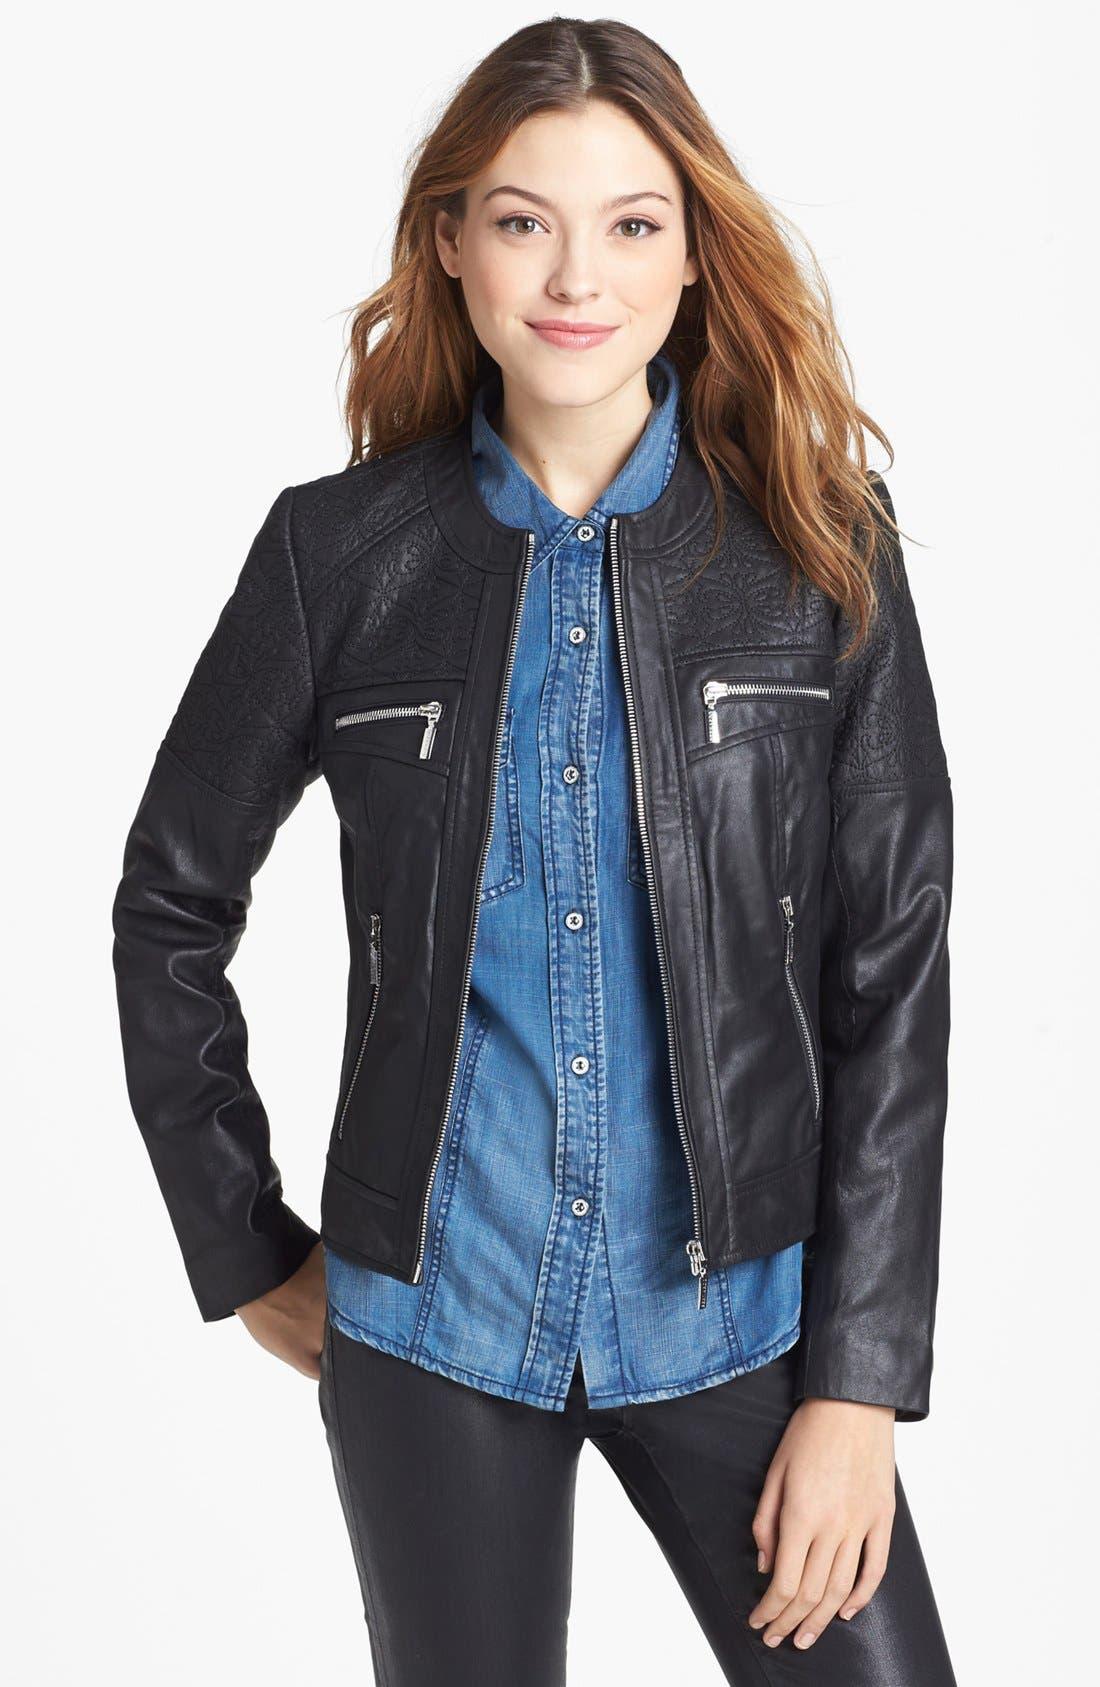 Alternate Image 1 Selected - Bernardo Embroidered Leather Scuba Jacket (Regular & Petite)